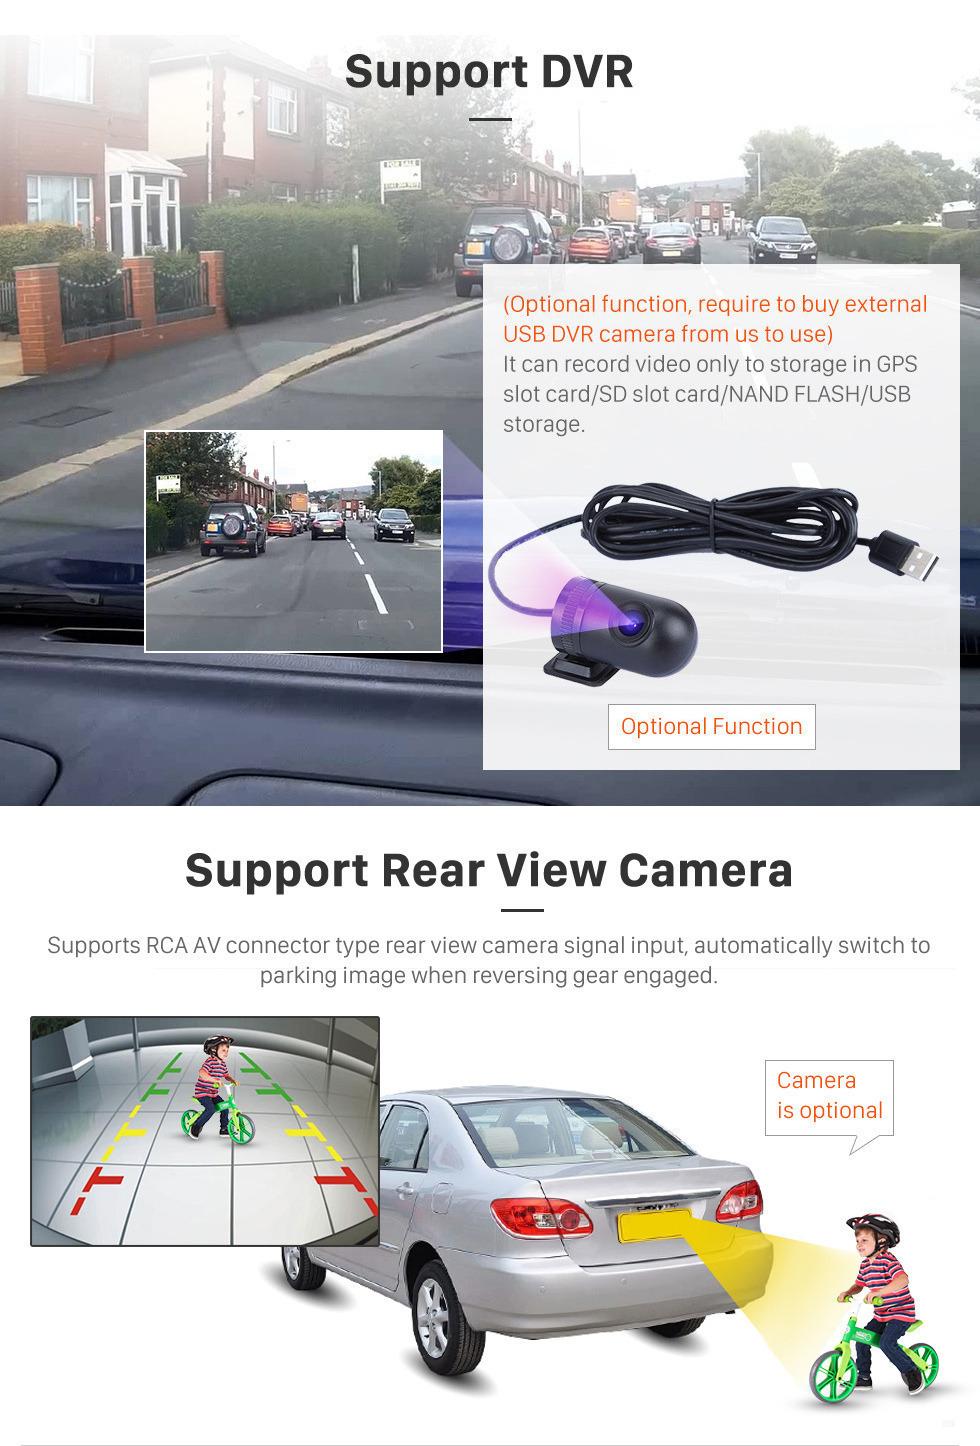 Seicane 9 pulgadas 2011-2016 Hyundai Elantra Android 9.0 HD Pantalla táctil GPS Sistema de navegación multimedia Reproductor multimedia Bluetooth Radio Soporte DVR OBD II 3G / 4G WiFi Cámara trasera Control del volante